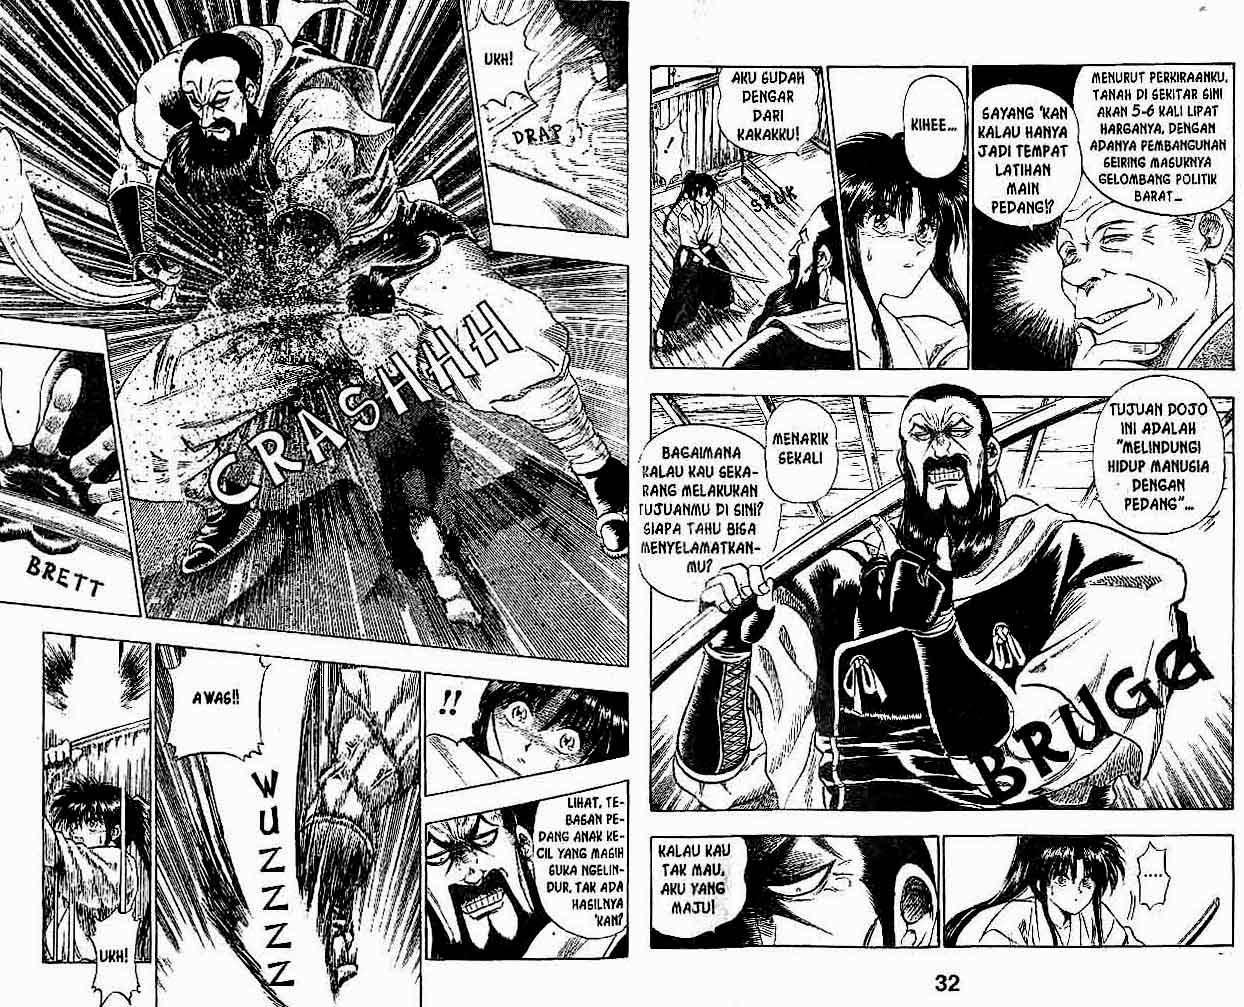 Komik Samurai X Pdf